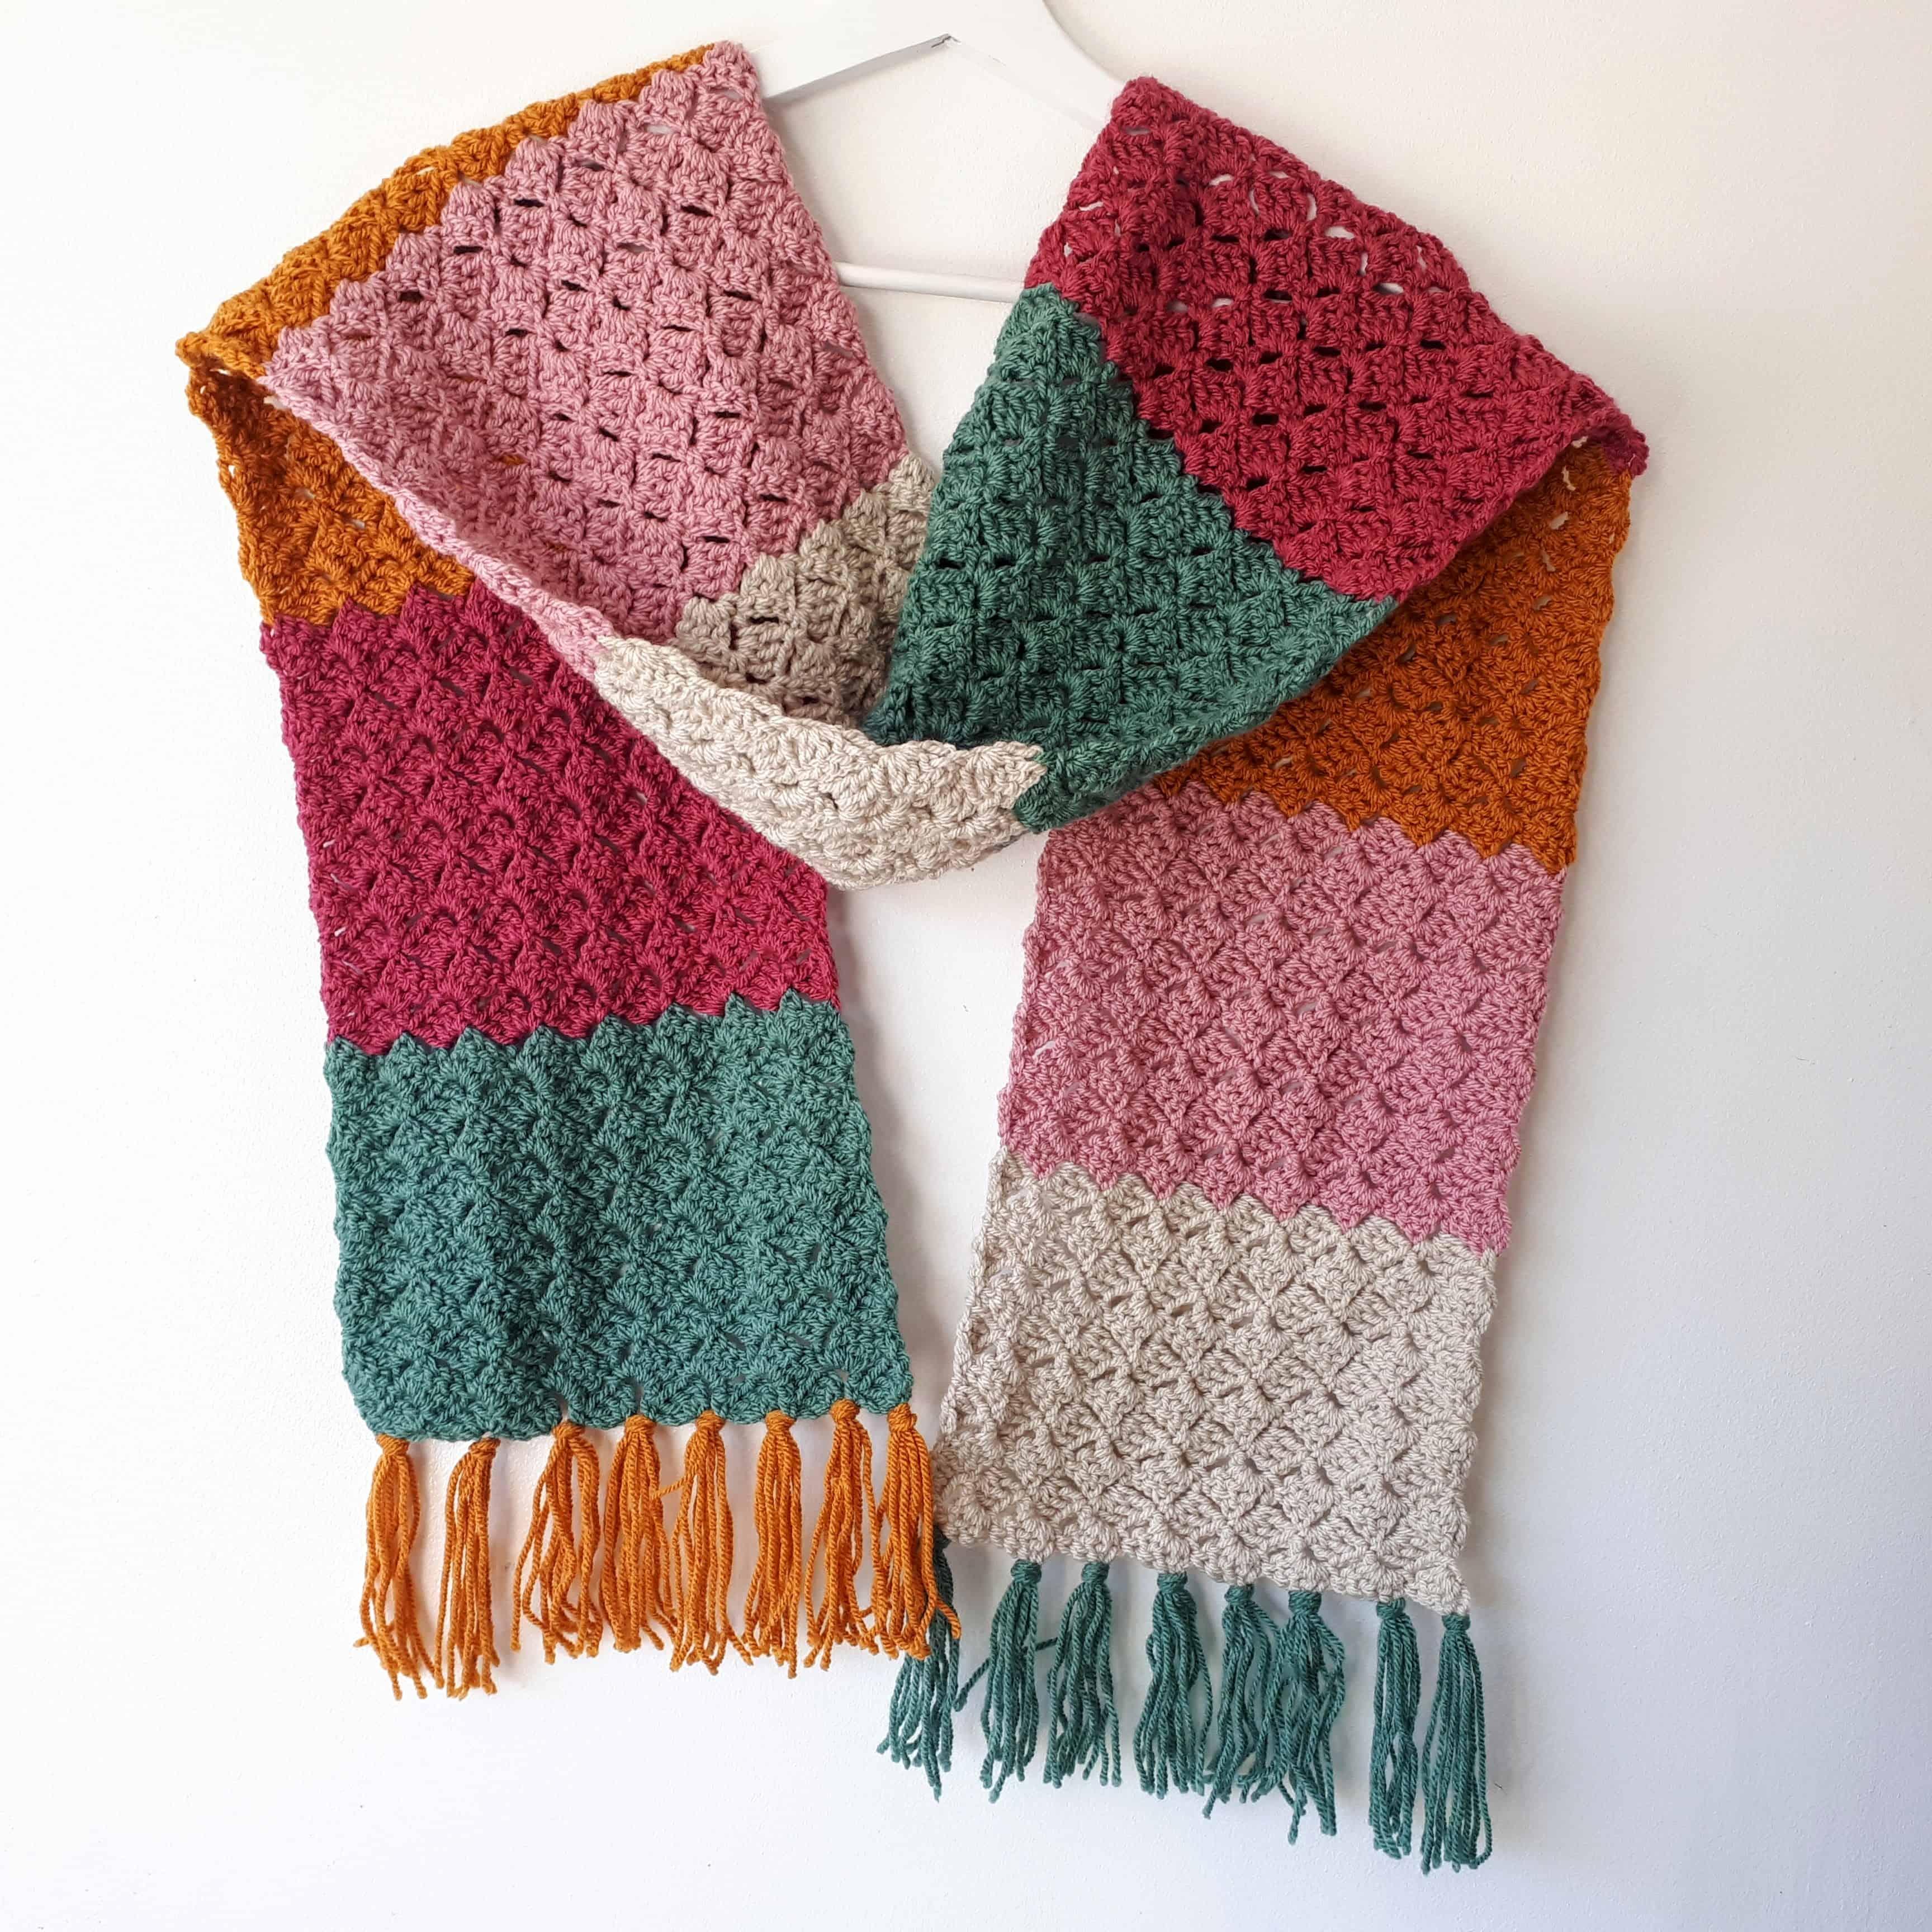 Crochet Color-Block Scarf - Easy Free Pattern - Annie Design Crochet - Crochet Scarf